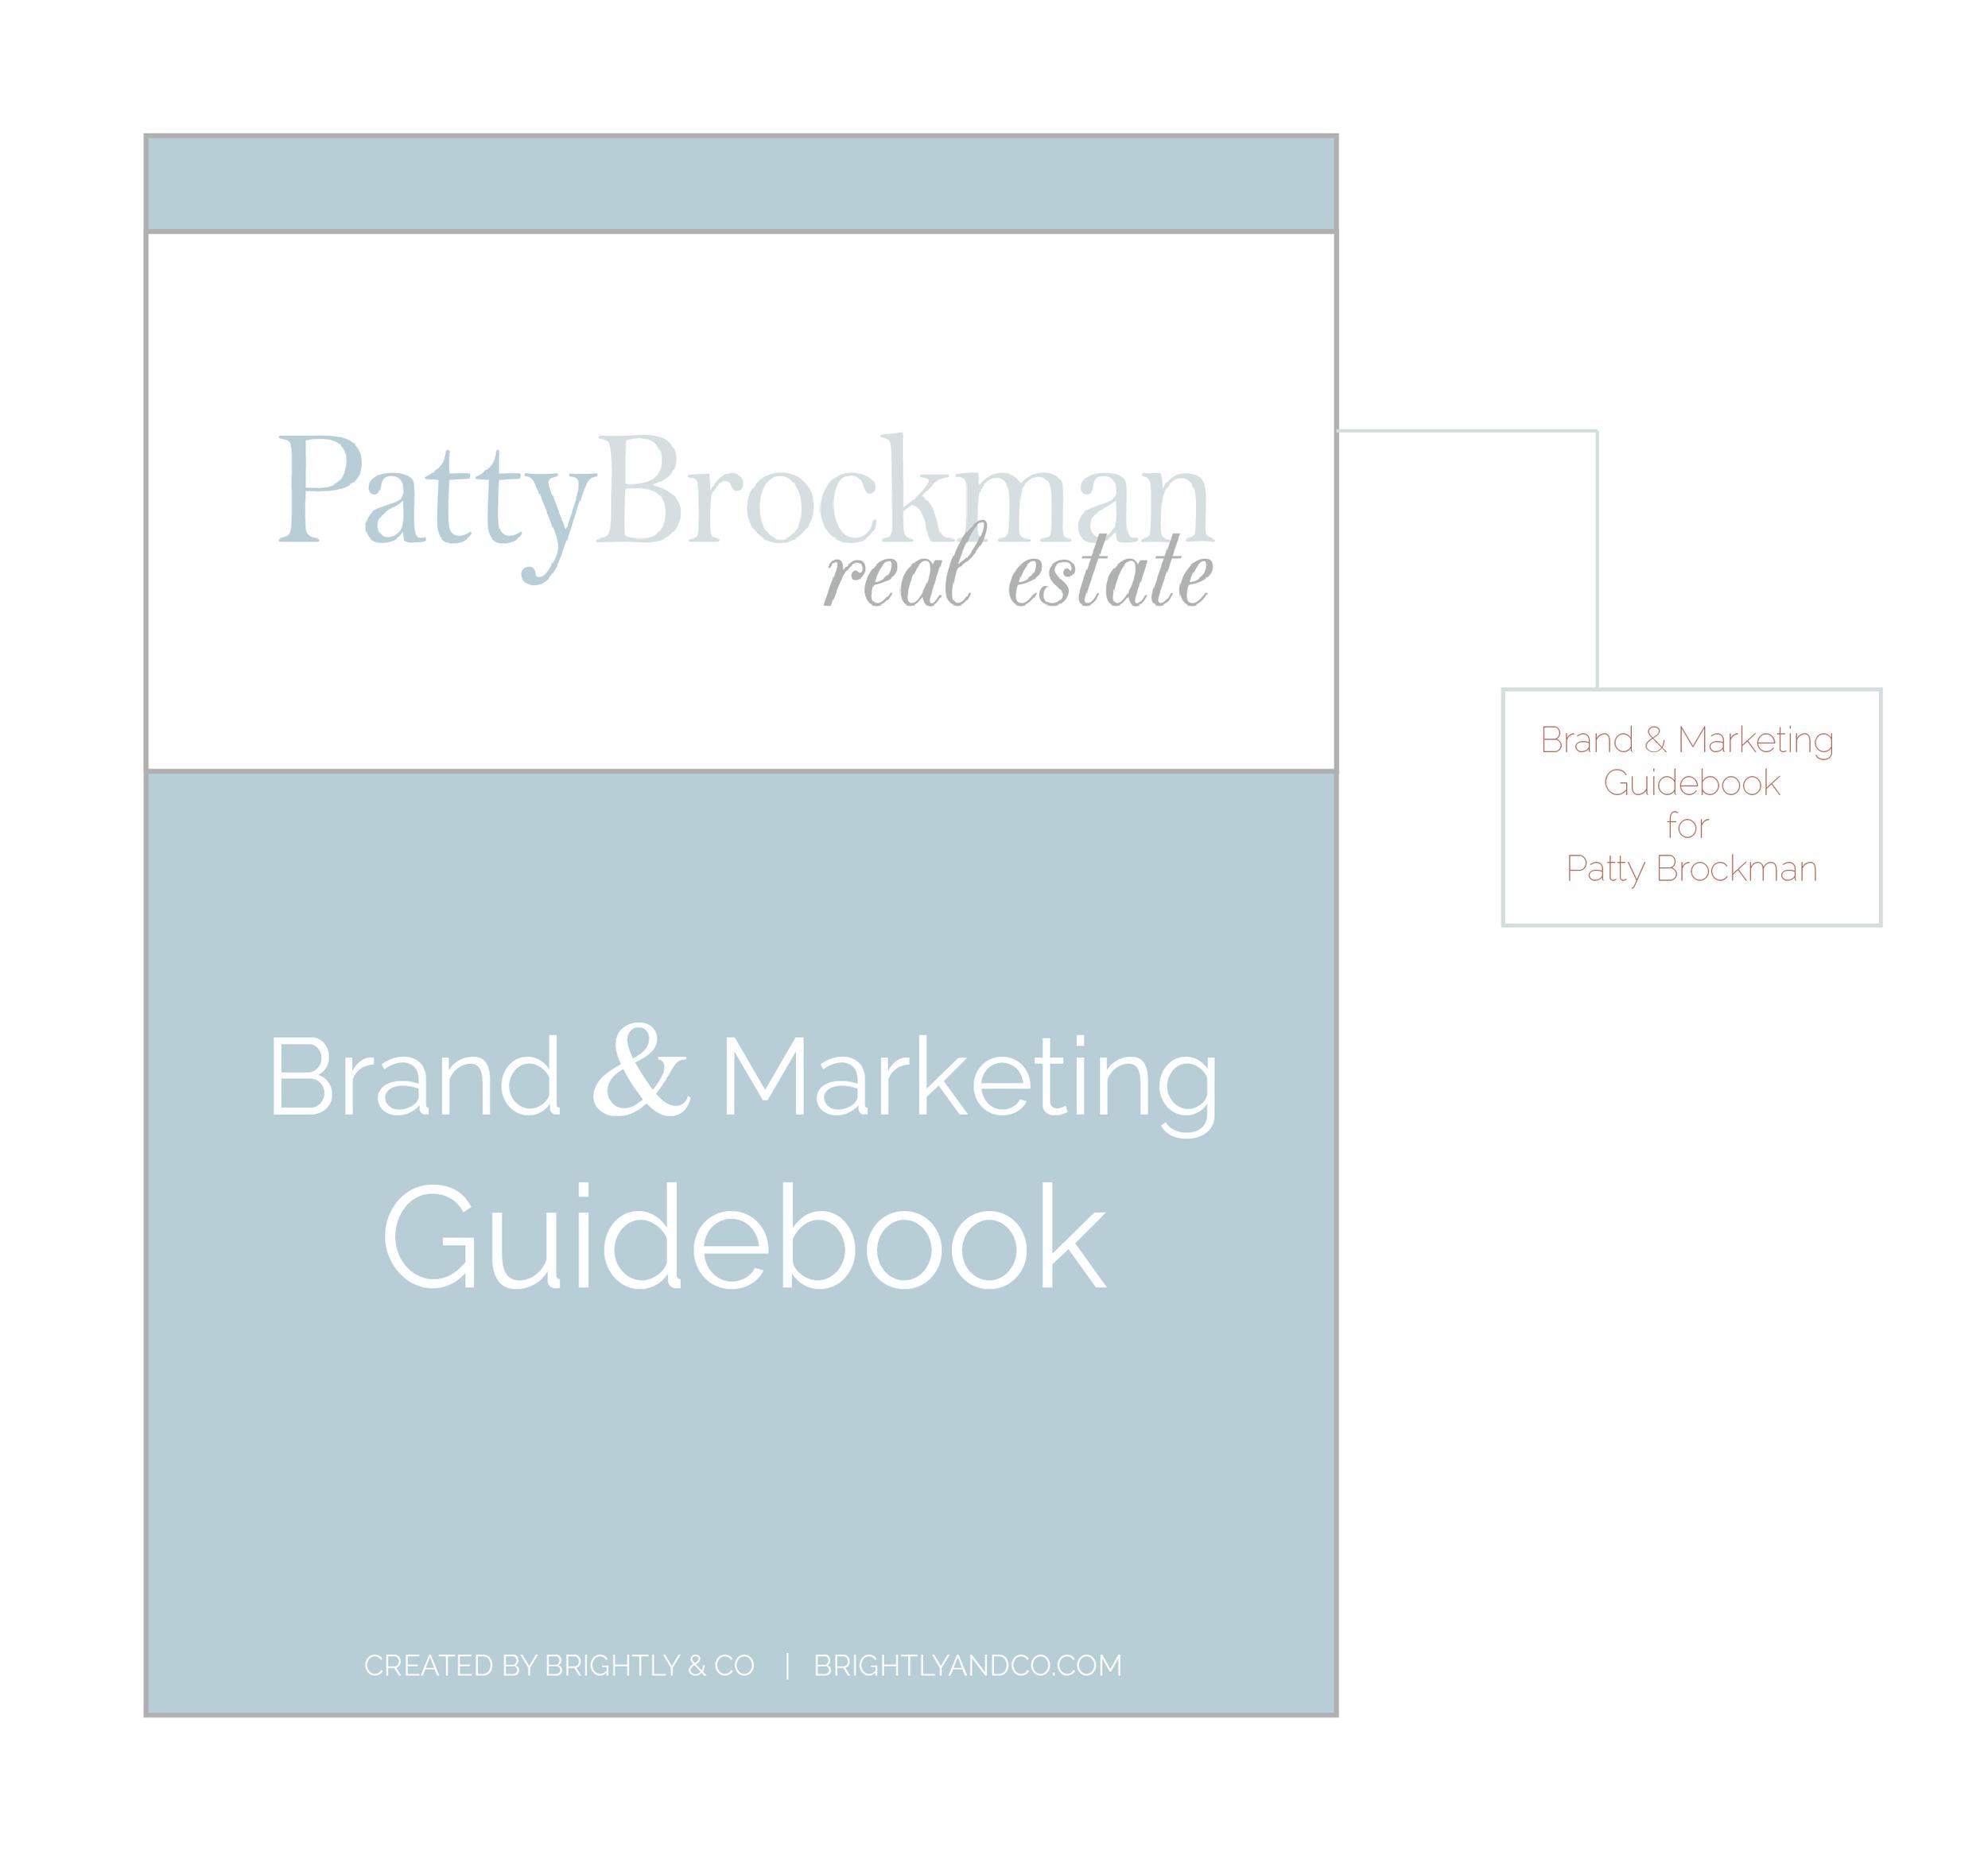 Patty Brockman Real Estate Brand Design by Brightly & Co. | www.BrightlyandCo.com